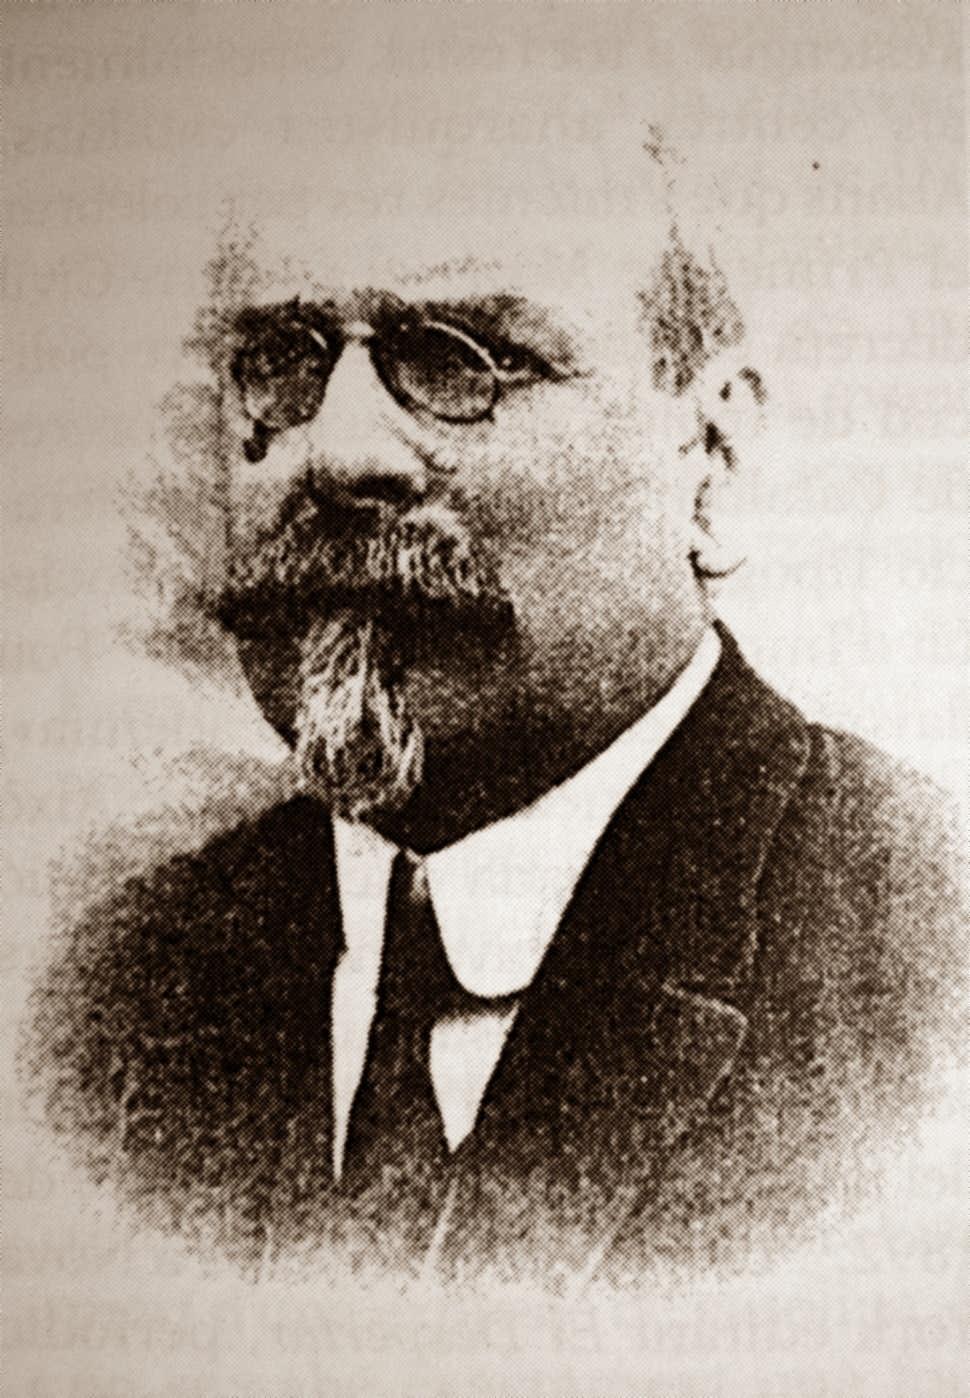 Pedro Estevé (Vida y obra)